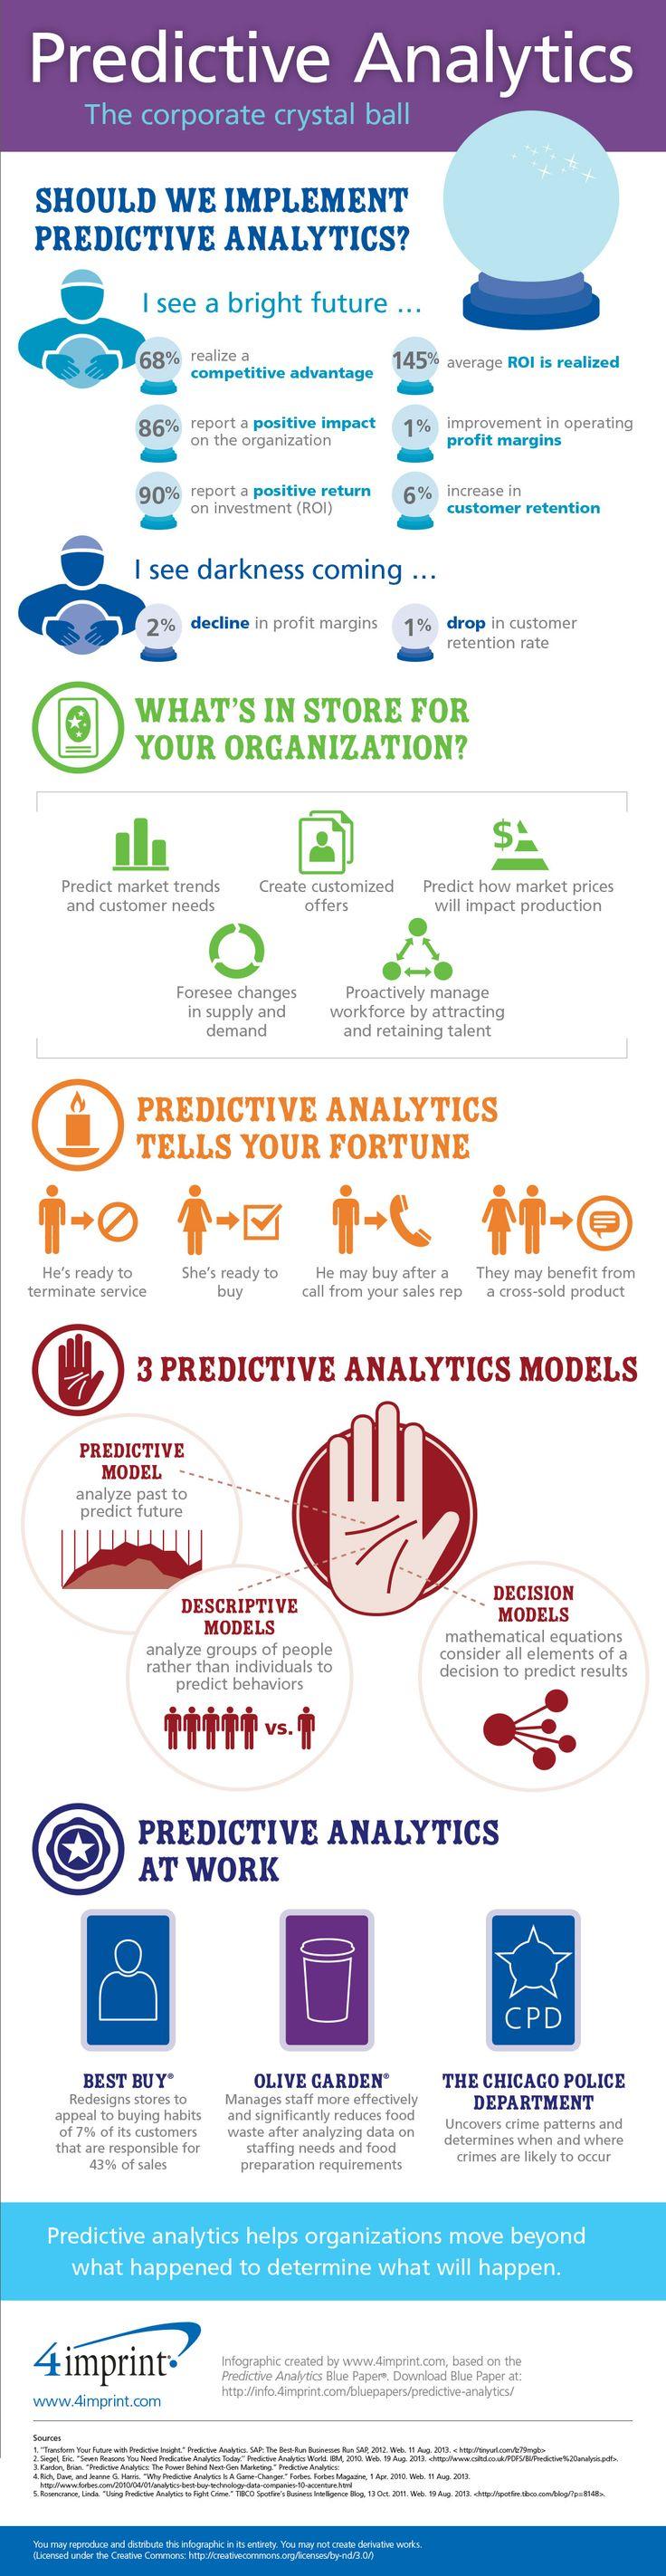 4Imprint Predictive Analytics Blue Paper